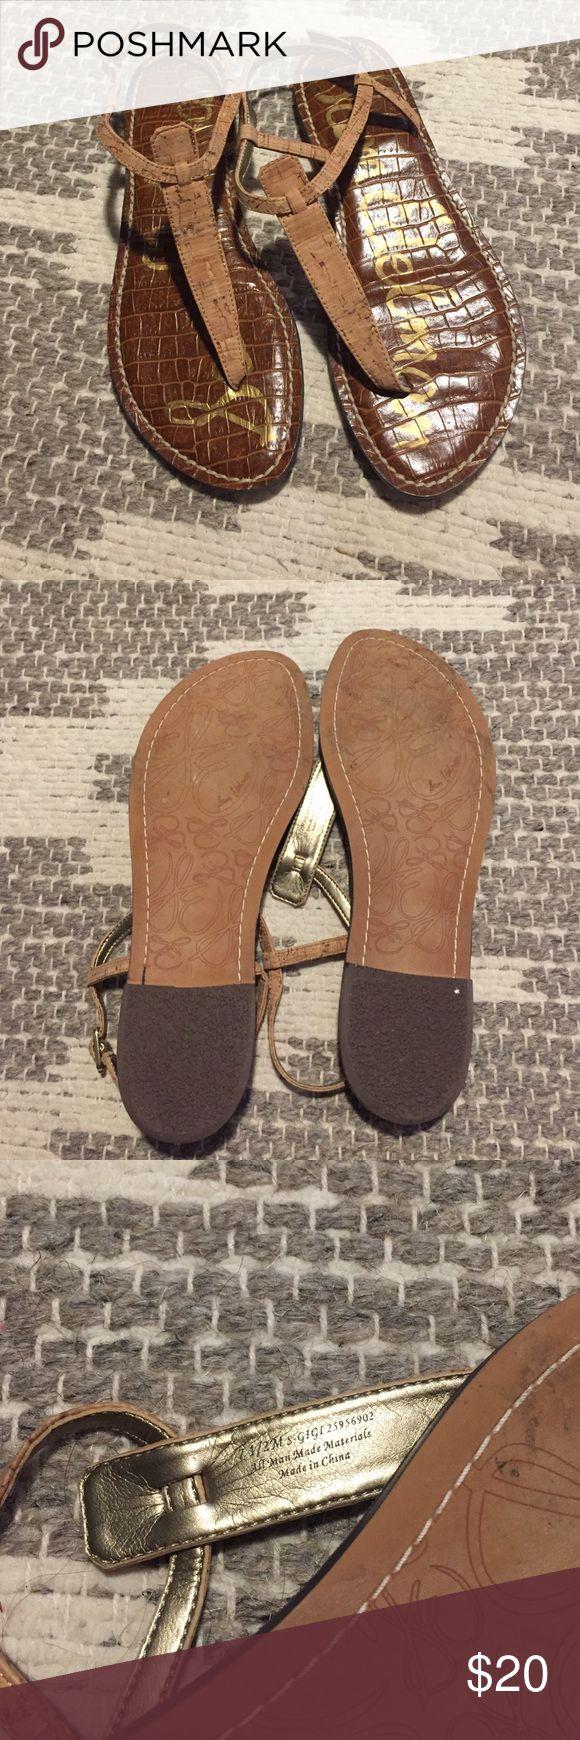 Sam Edelman Gigi cork sandals Worn once- like new! Sam Edelman Shoes Sandals